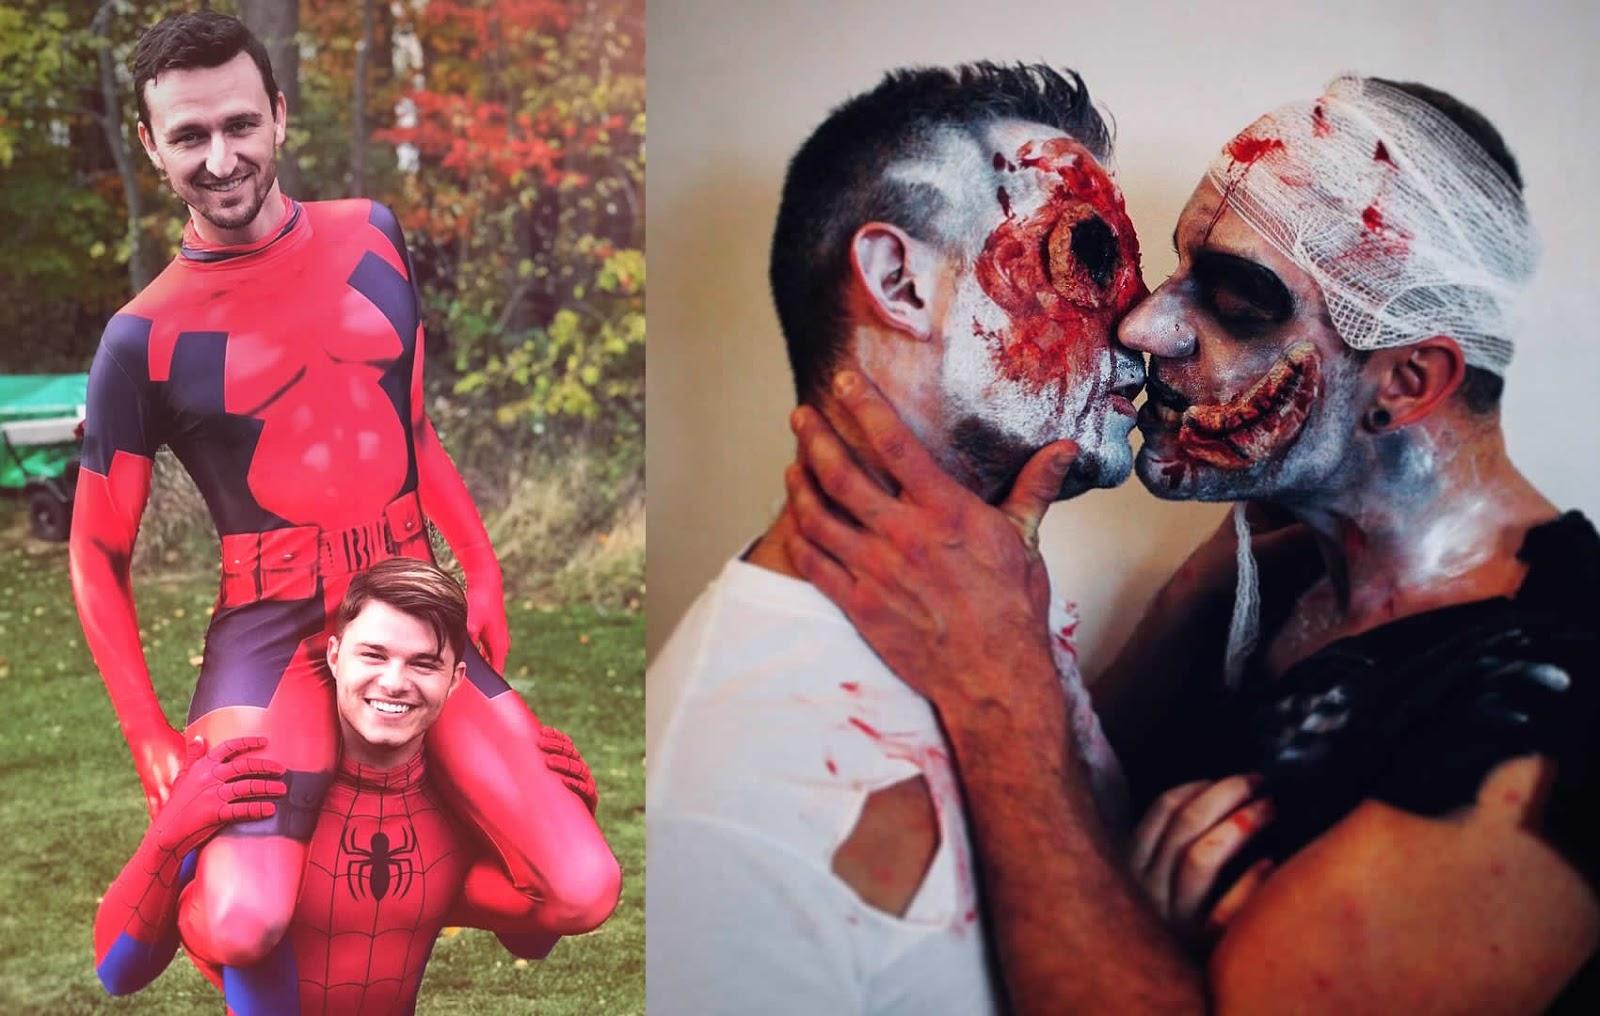 13 casais do mesmo sexo que arrasaram nas fantasias no Halloween